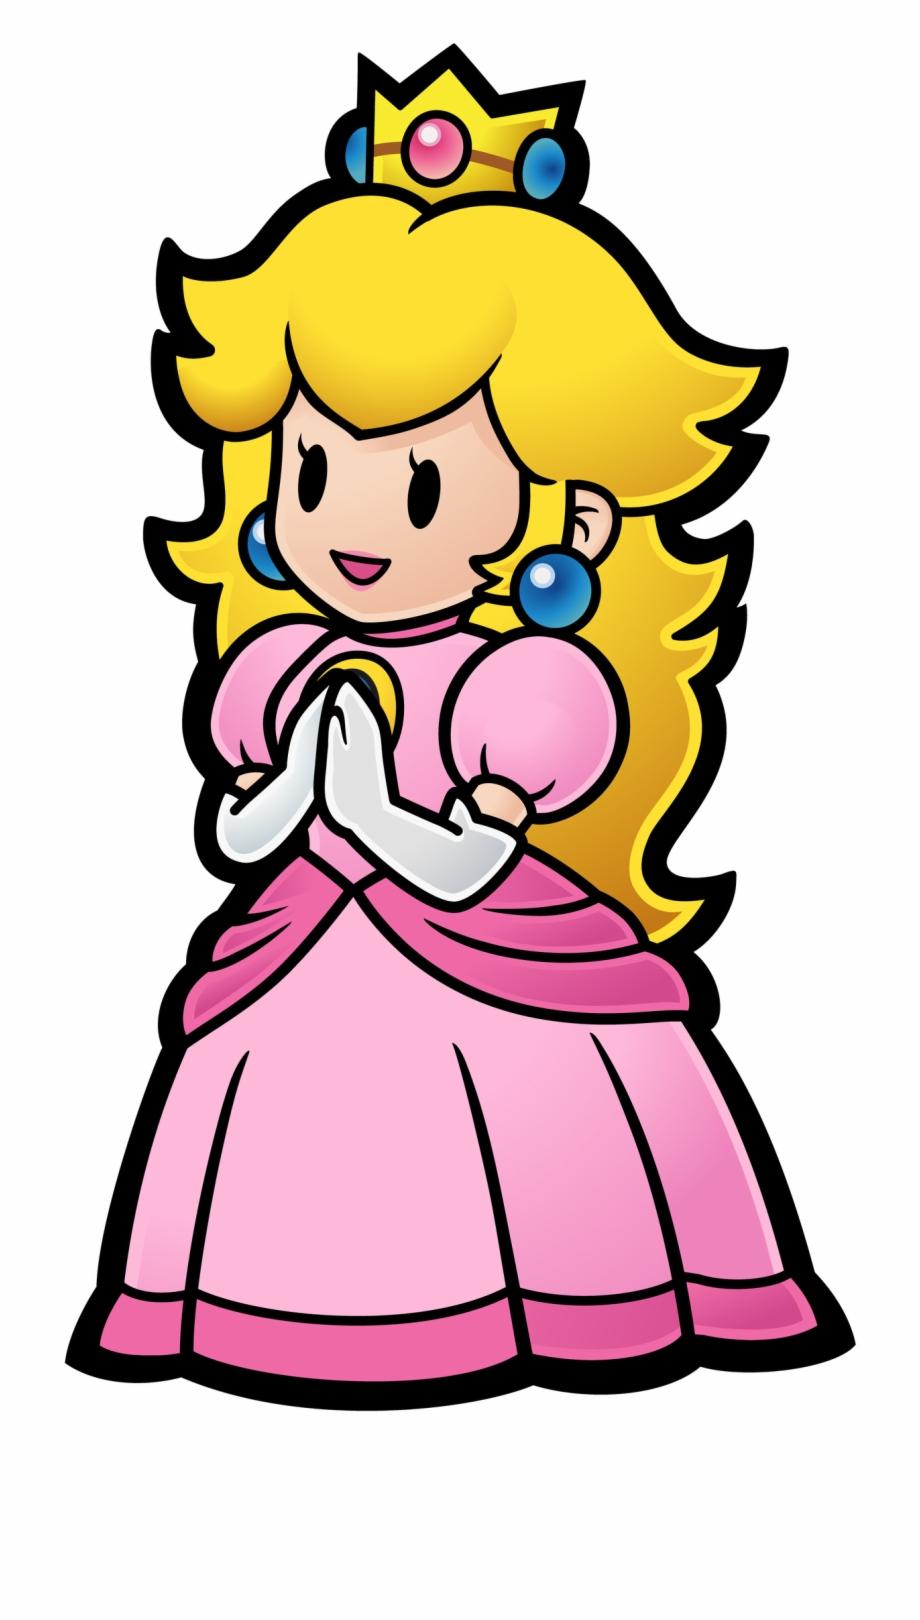 Princess Peach Png Image Ms P Paper Mario Transparent